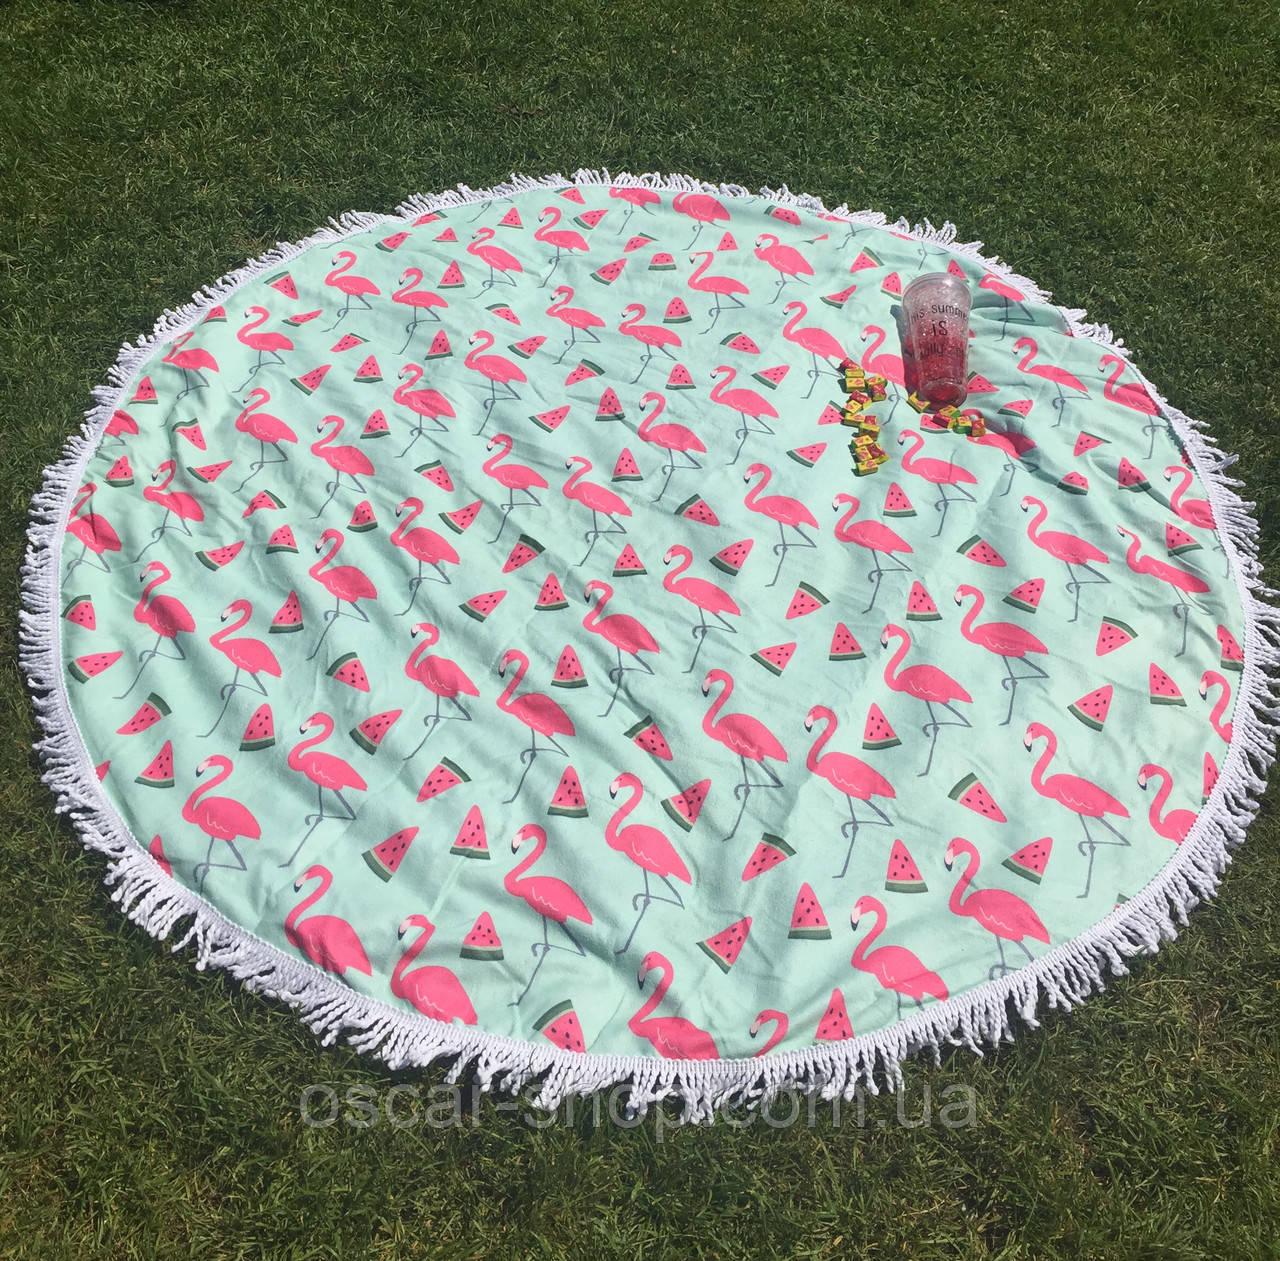 Пляжное круглое полотенце /подстилка Фламинго Мандала 165 см /полотенце на пляж /пляжный коврик /опт